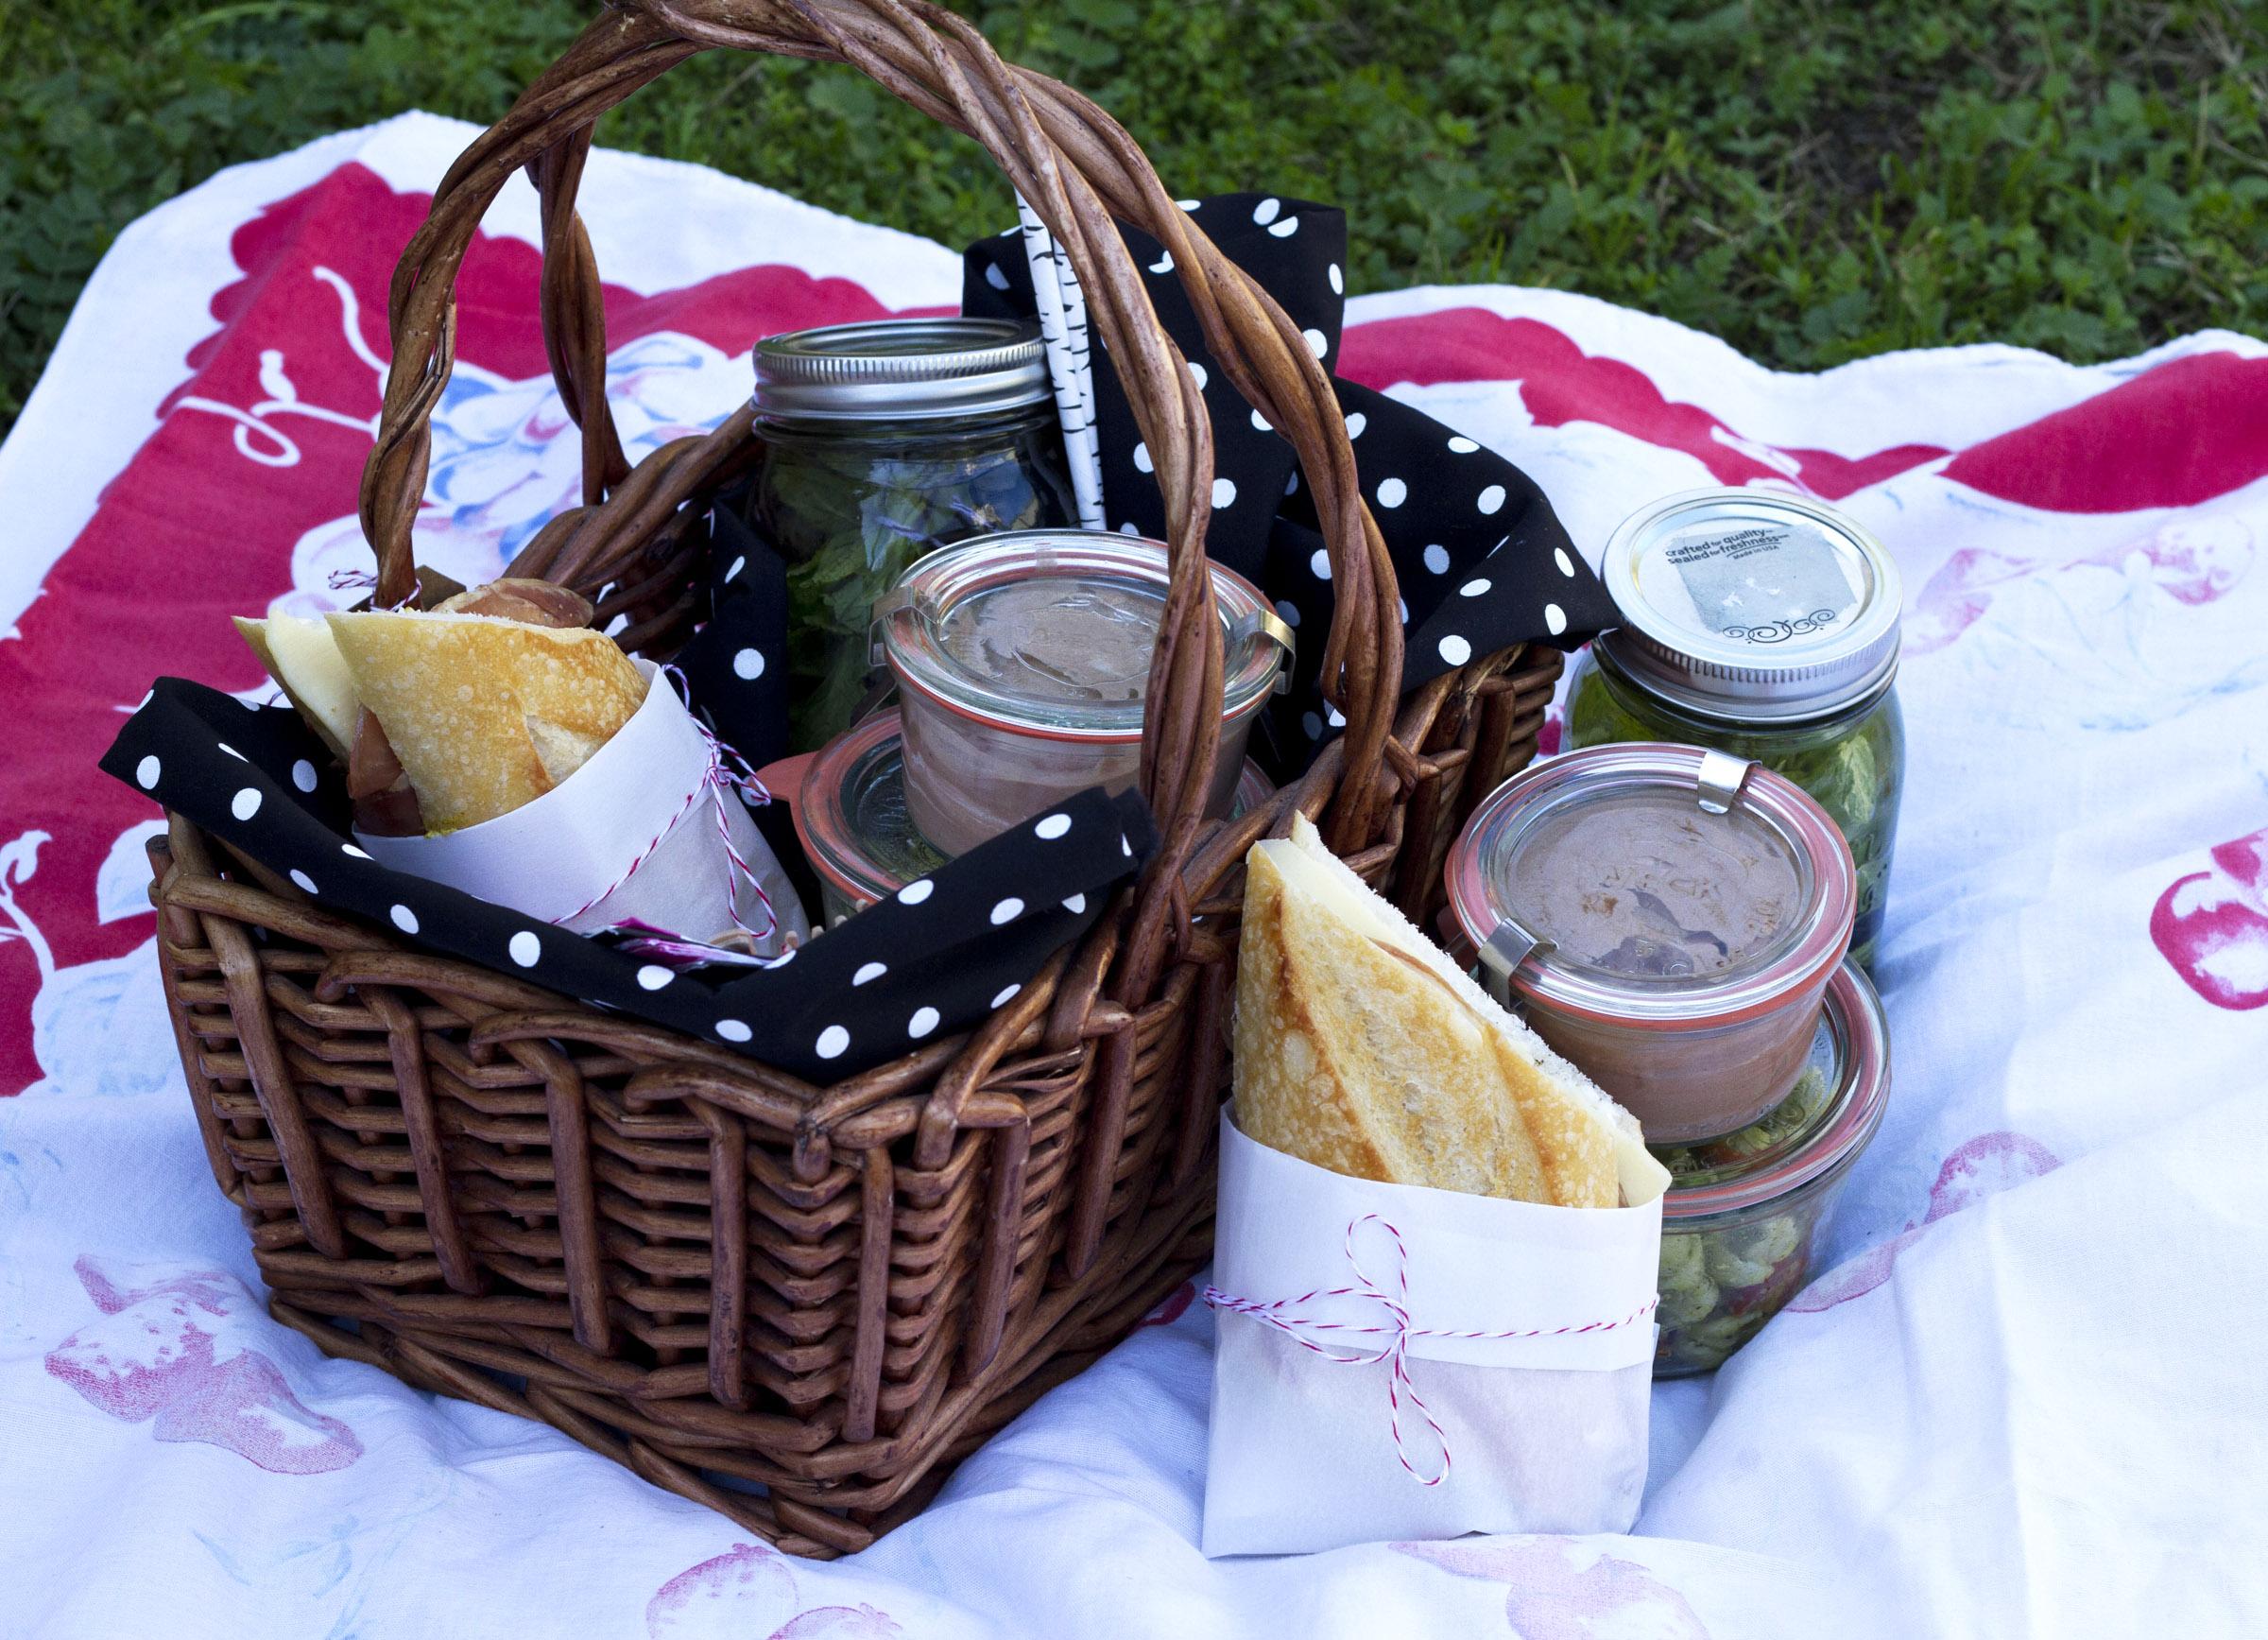 picnic on grass 1.jpg